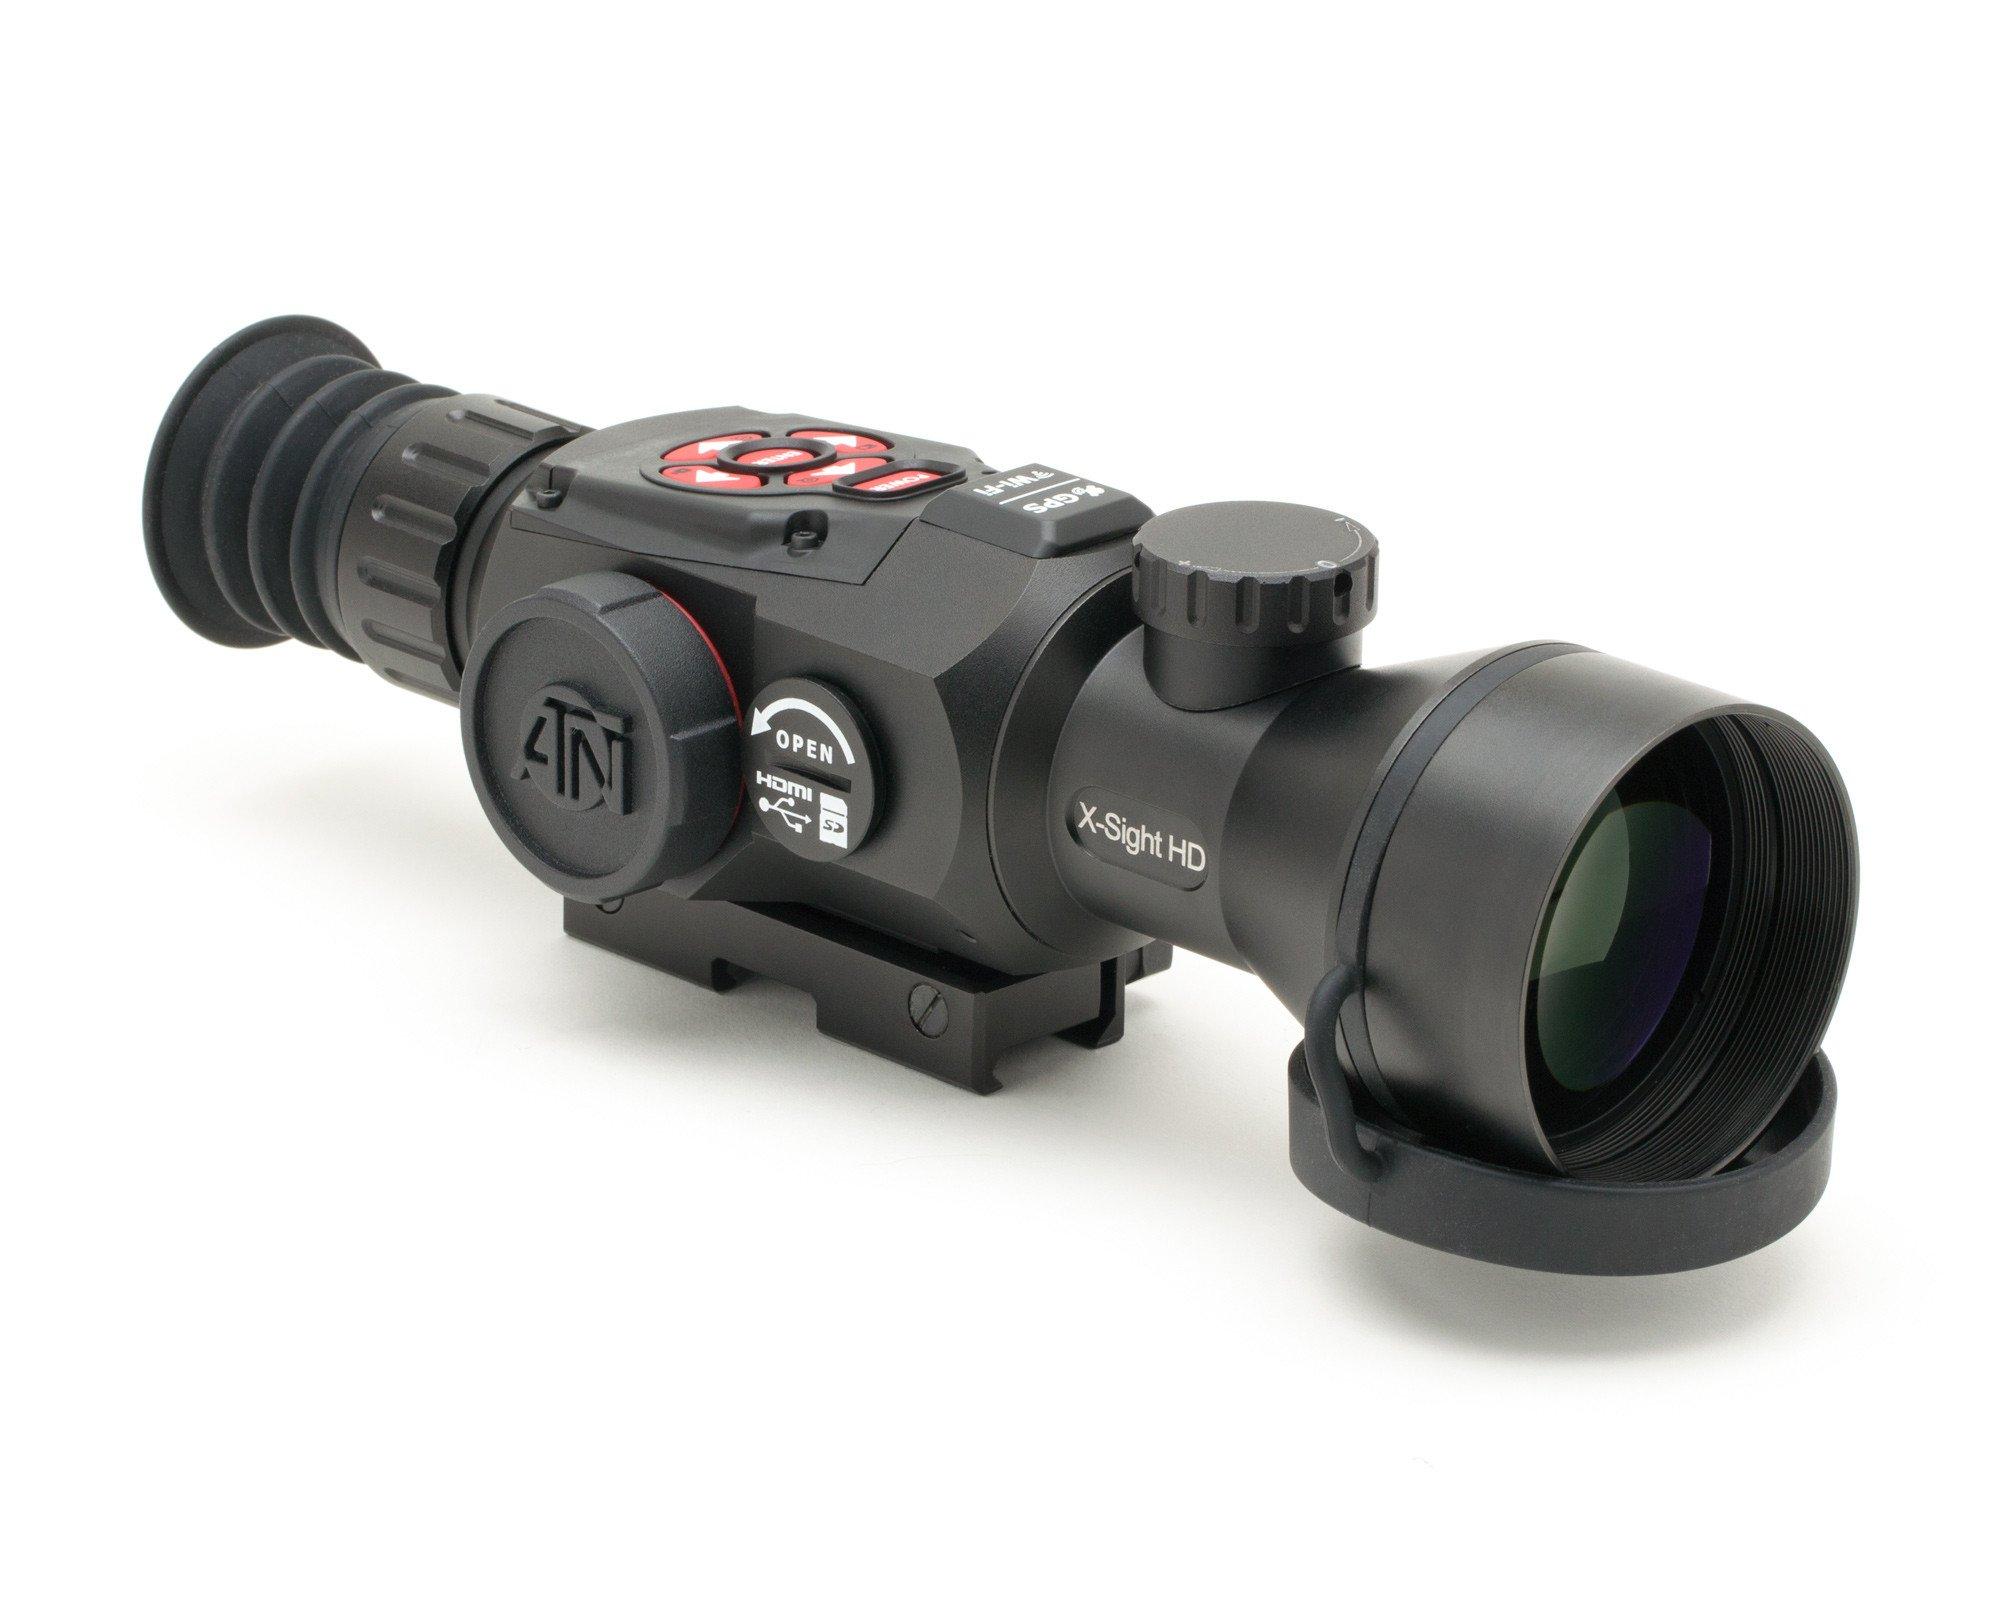 ATN X-Sight II Smart HD 5-20x Day & Night Vision Rifle Scope - Australian Tactical Precision